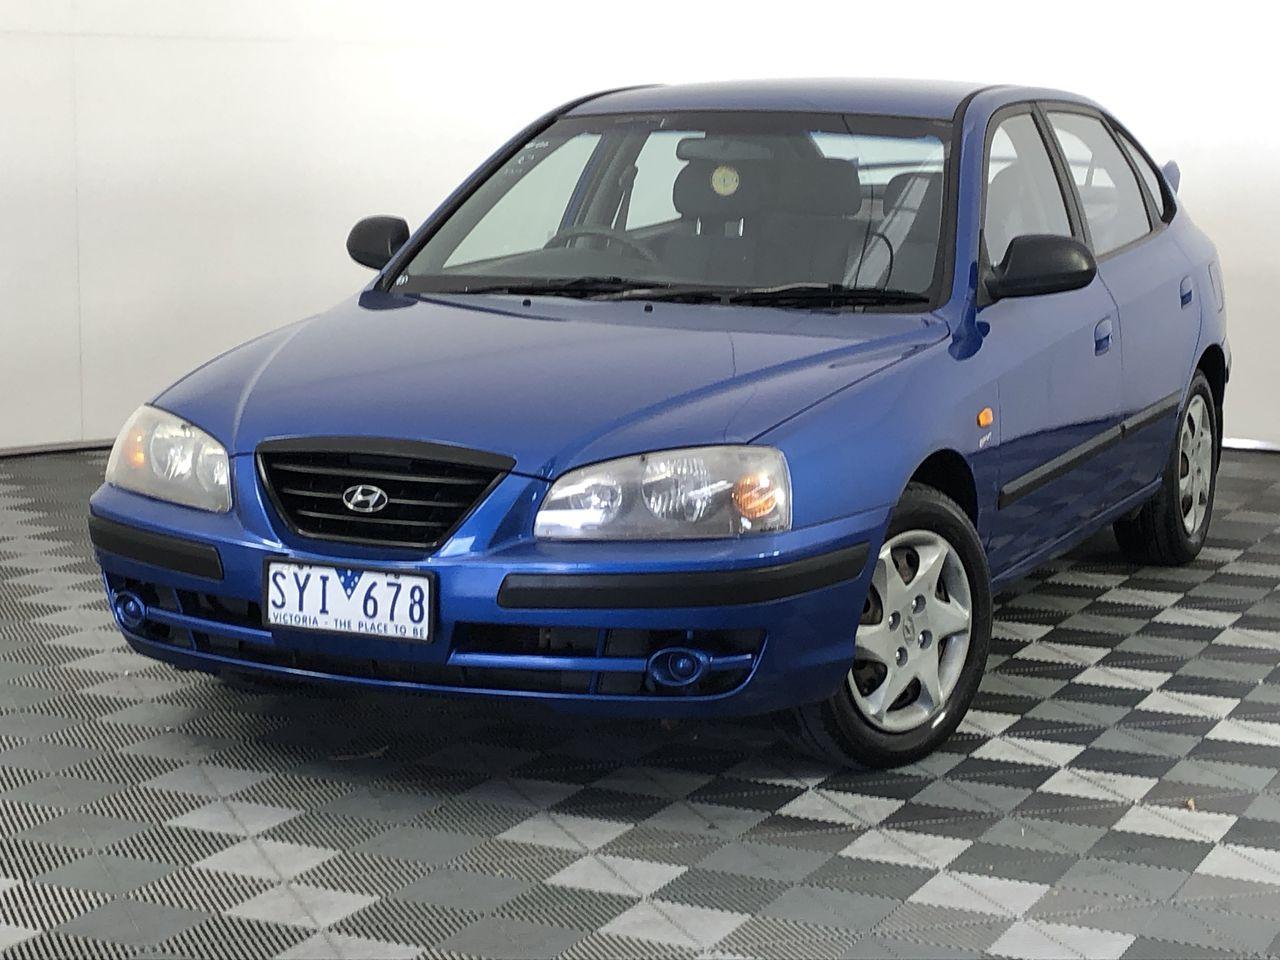 2004 Hyundai Elantra 2.0 HVT XD Manual Hatchback